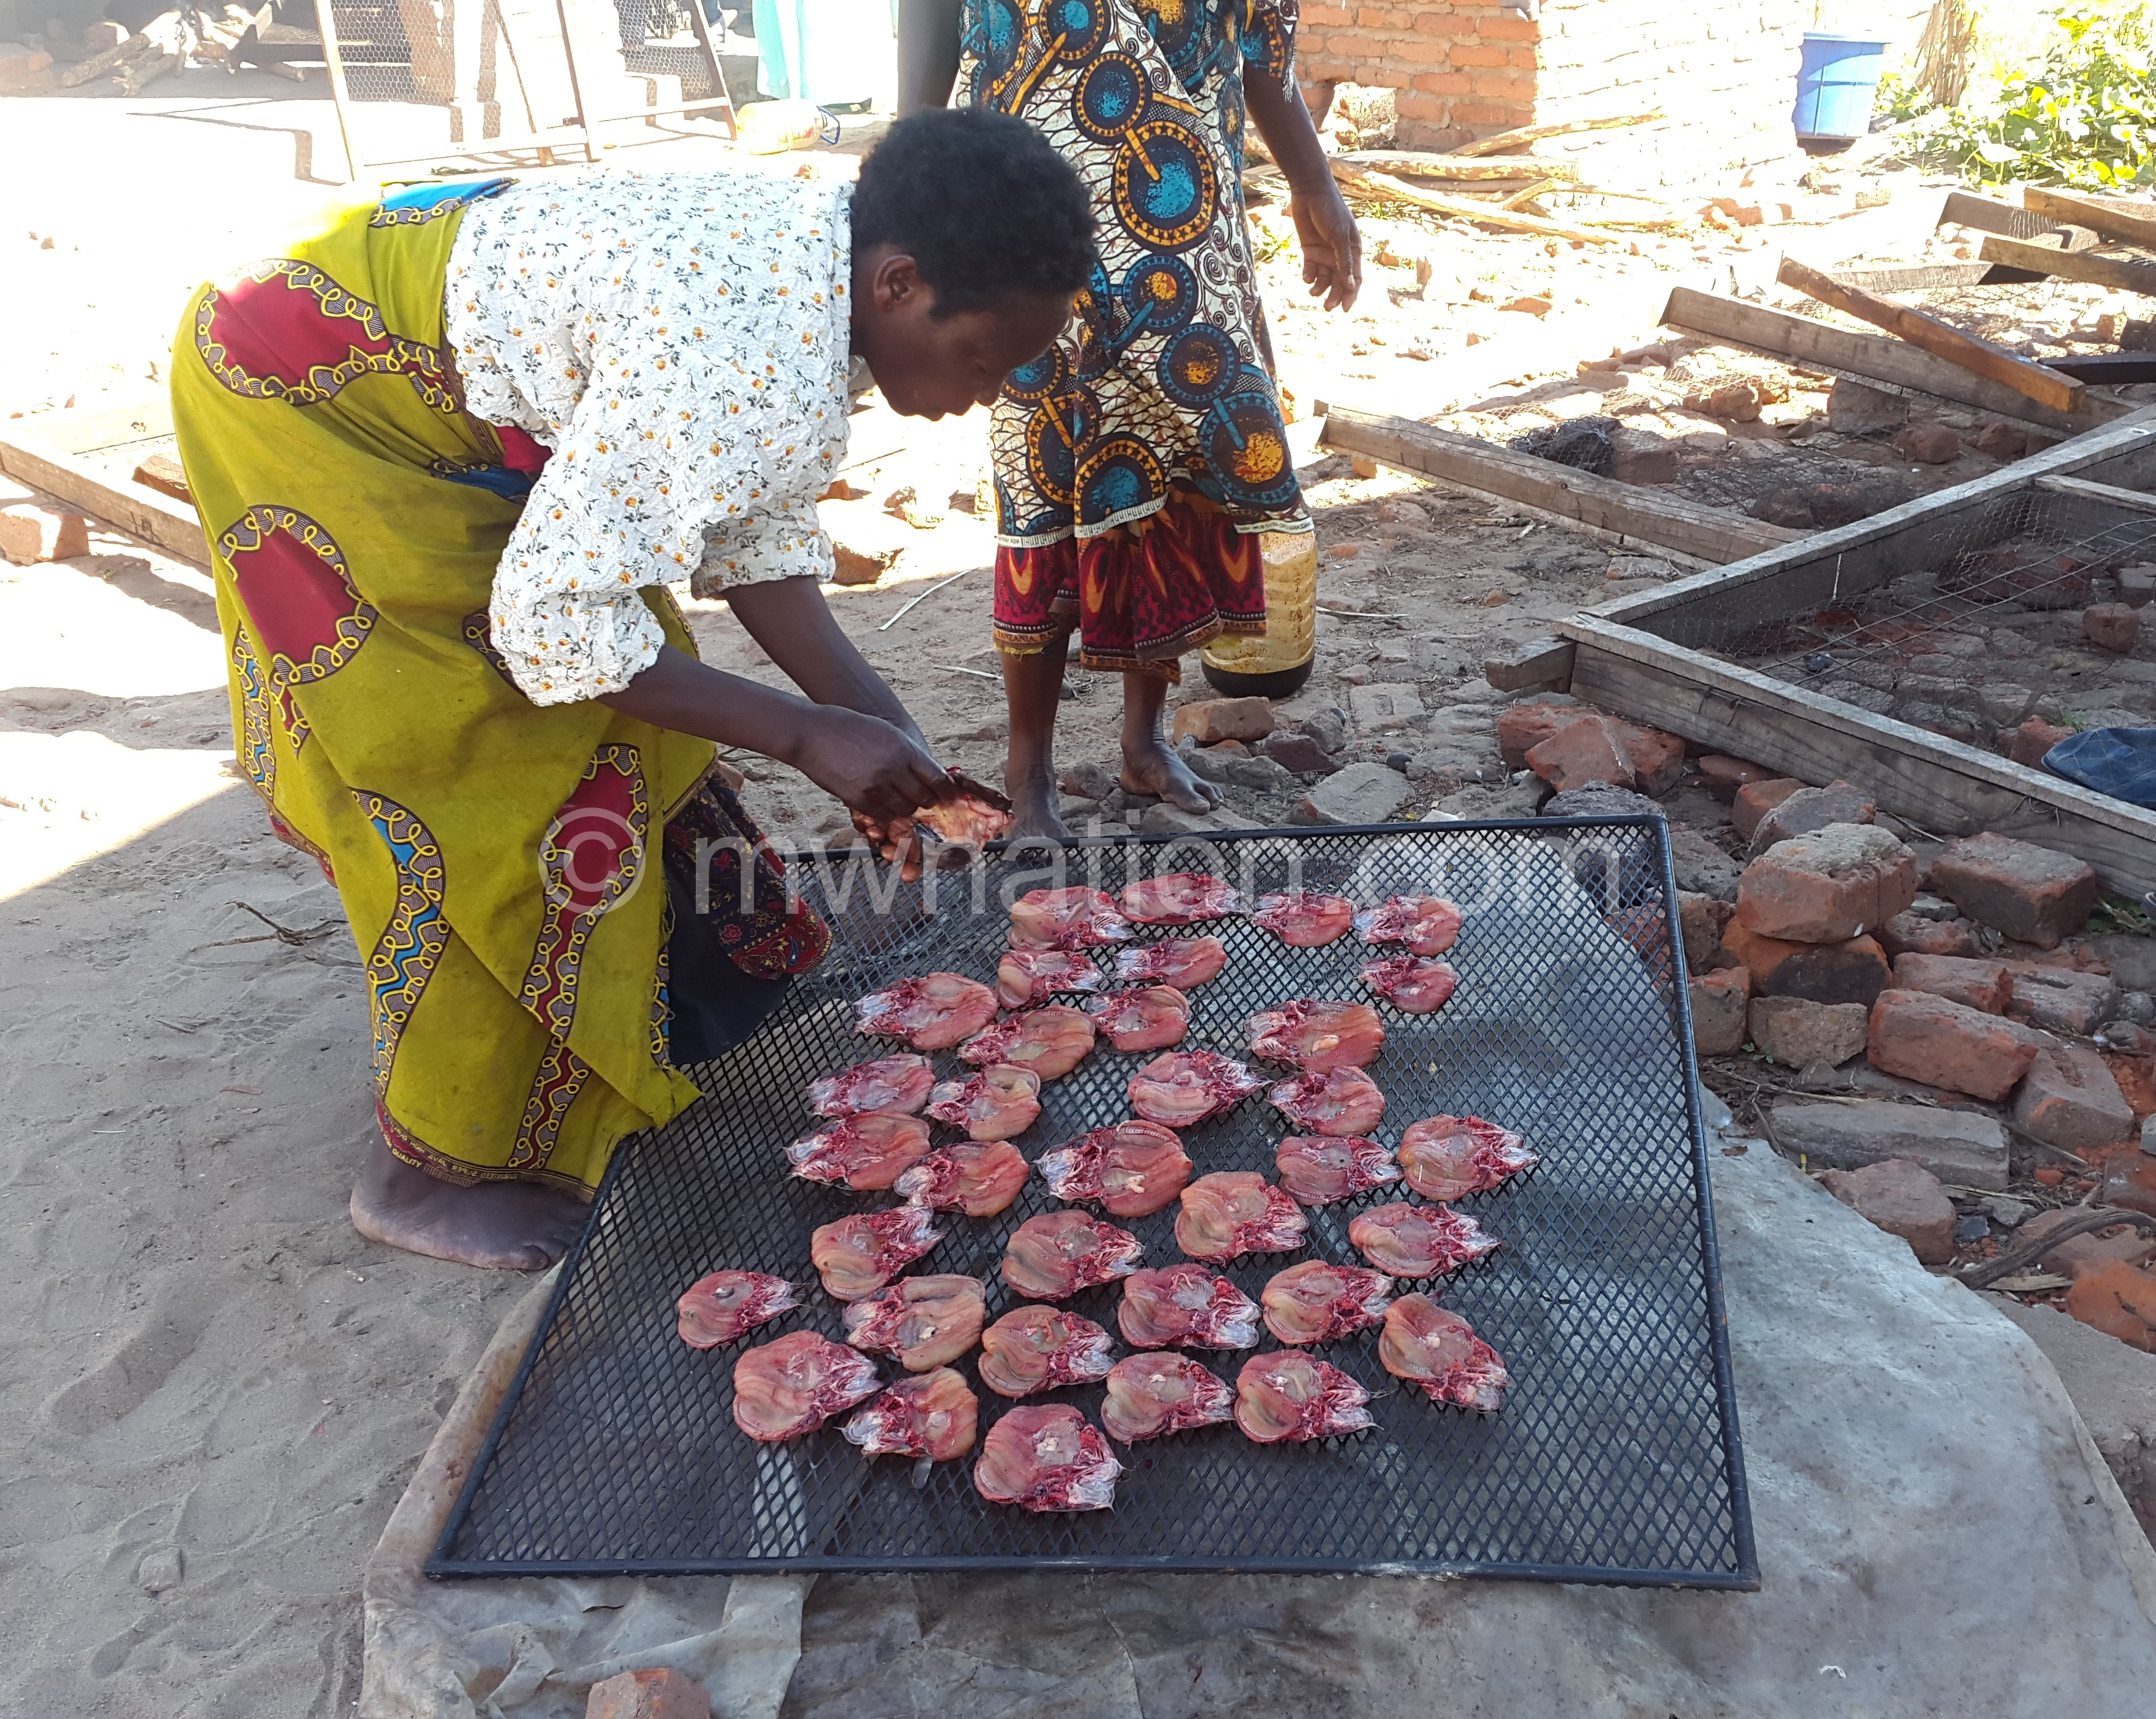 Kamata preparing the fish for smoking | The Nation Online